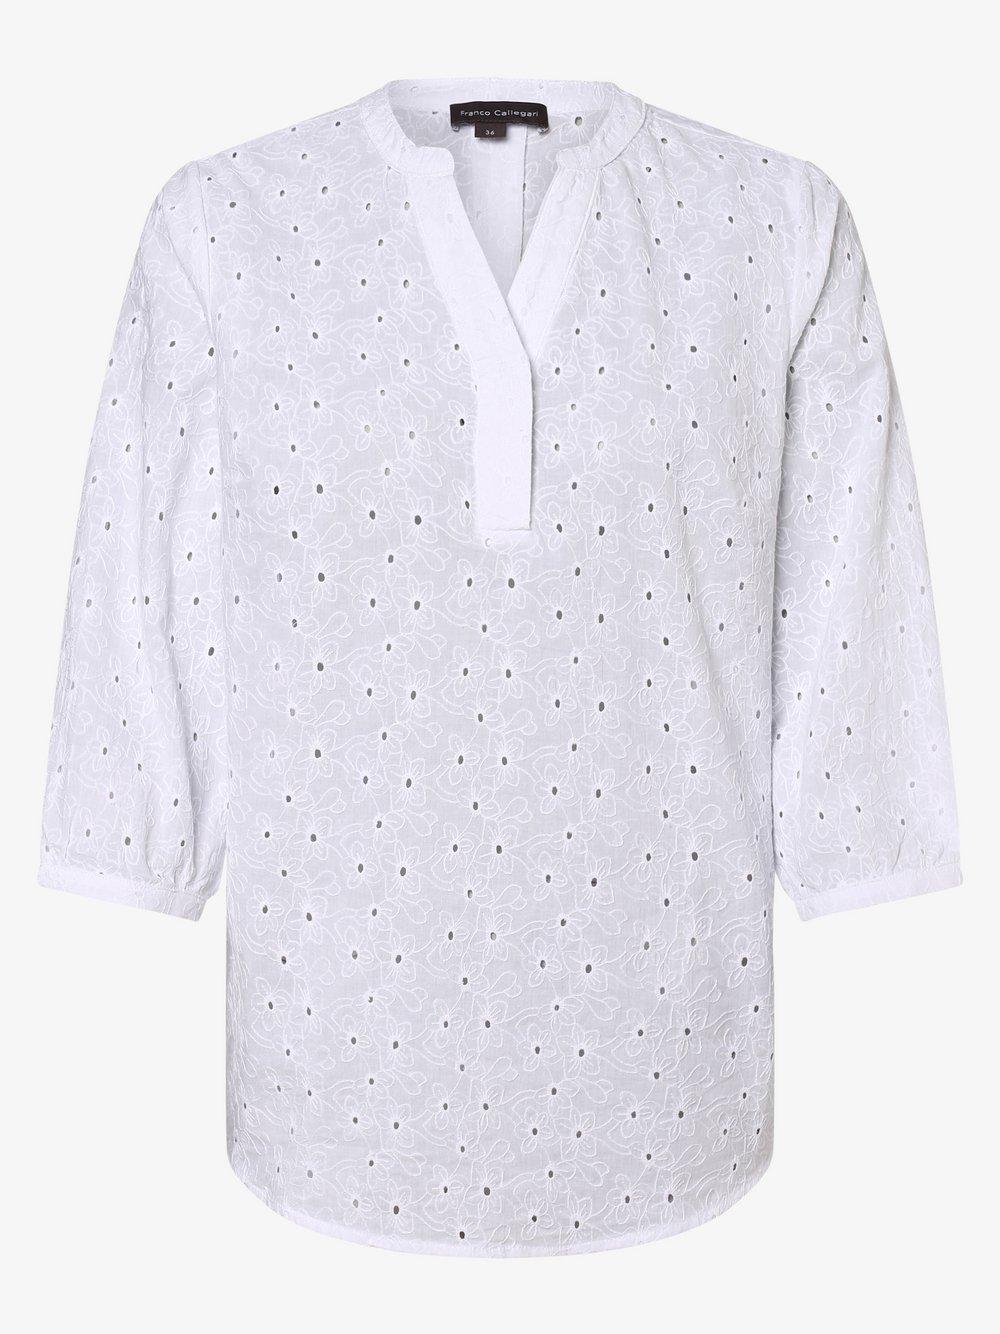 Franco Callegari – Bluzka damska, biały Van Graaf 430254-0010-00420